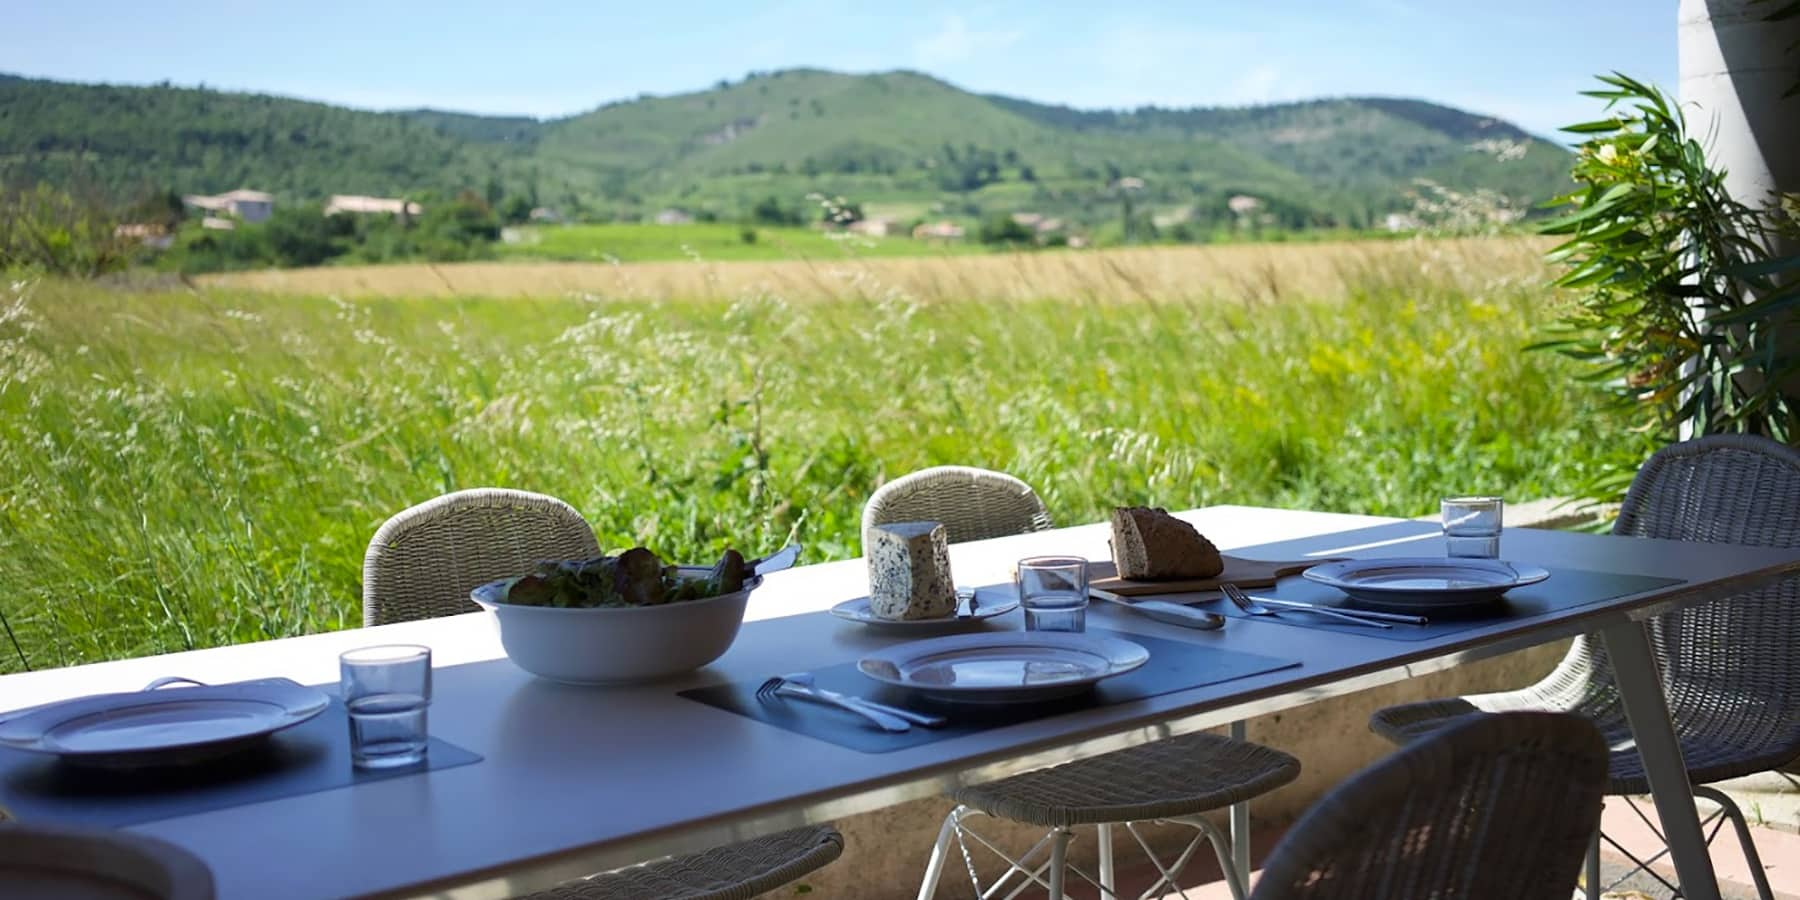 sejourner-sud-ardeche-rhone-villages_1800x900_acf_cropped